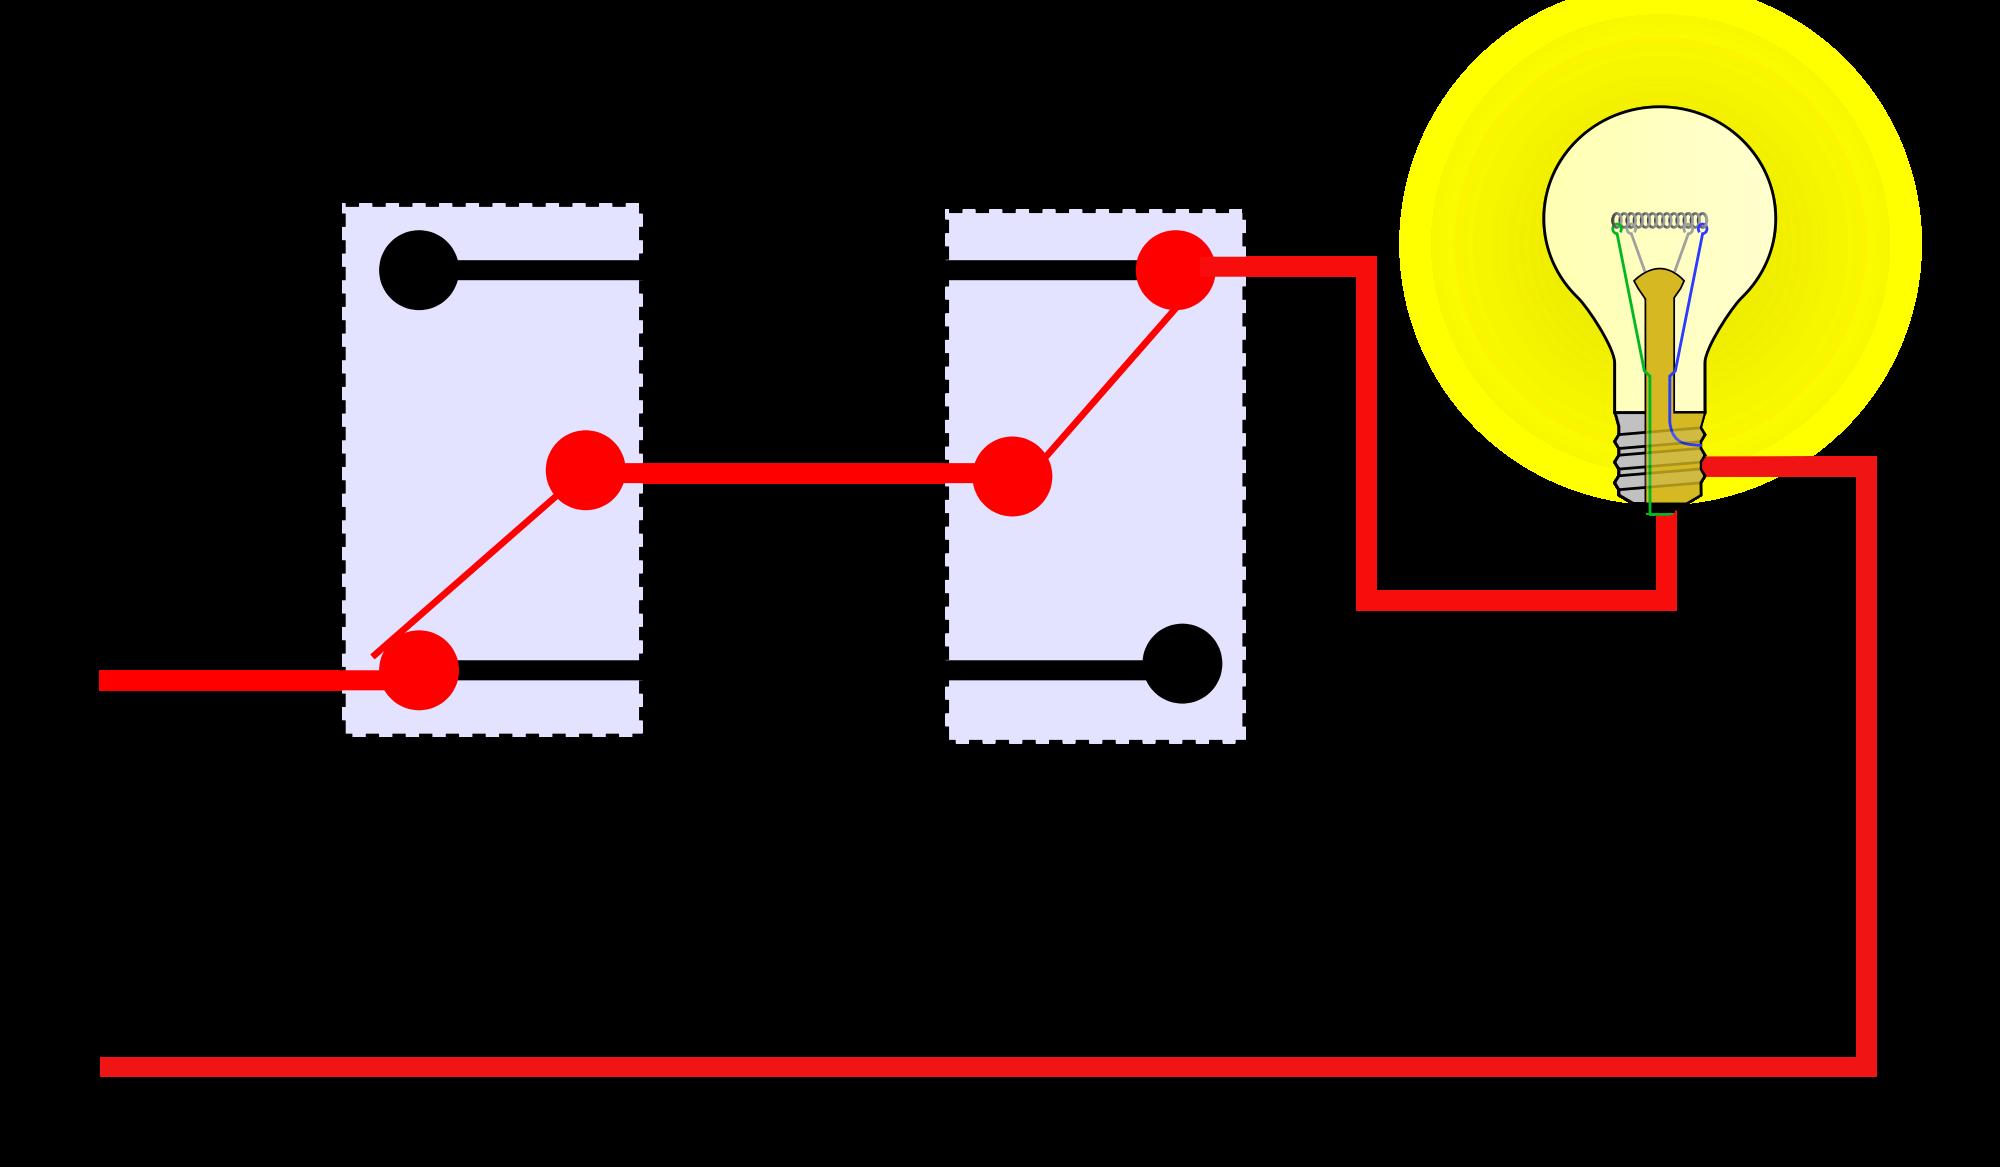 Basic Three-Way Switch Diagram